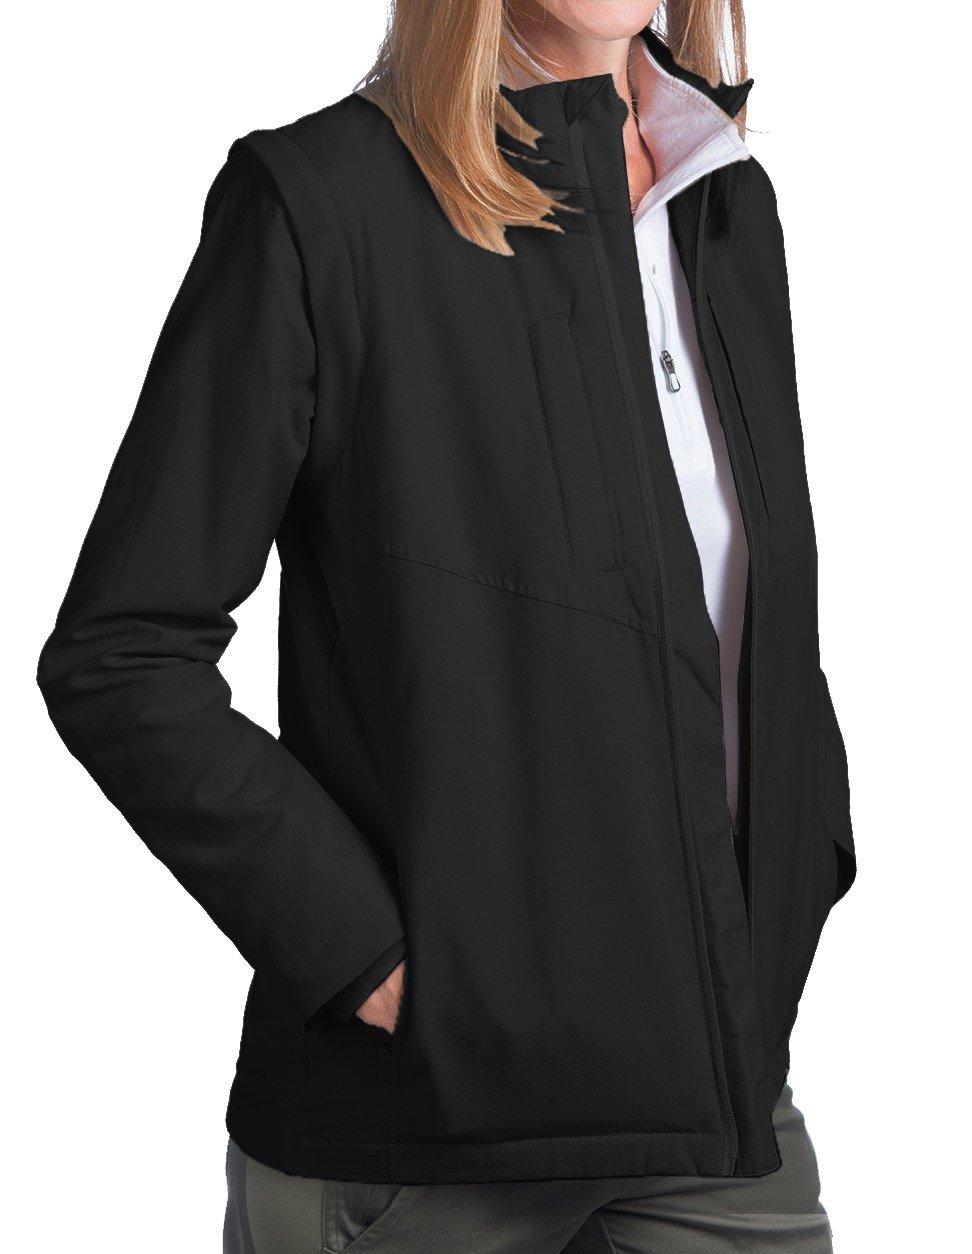 SCOTTeVEST Women's Standard Jacket - 25 Pockets - Travel Clothing (M3, Black) by SCOTTeVEST